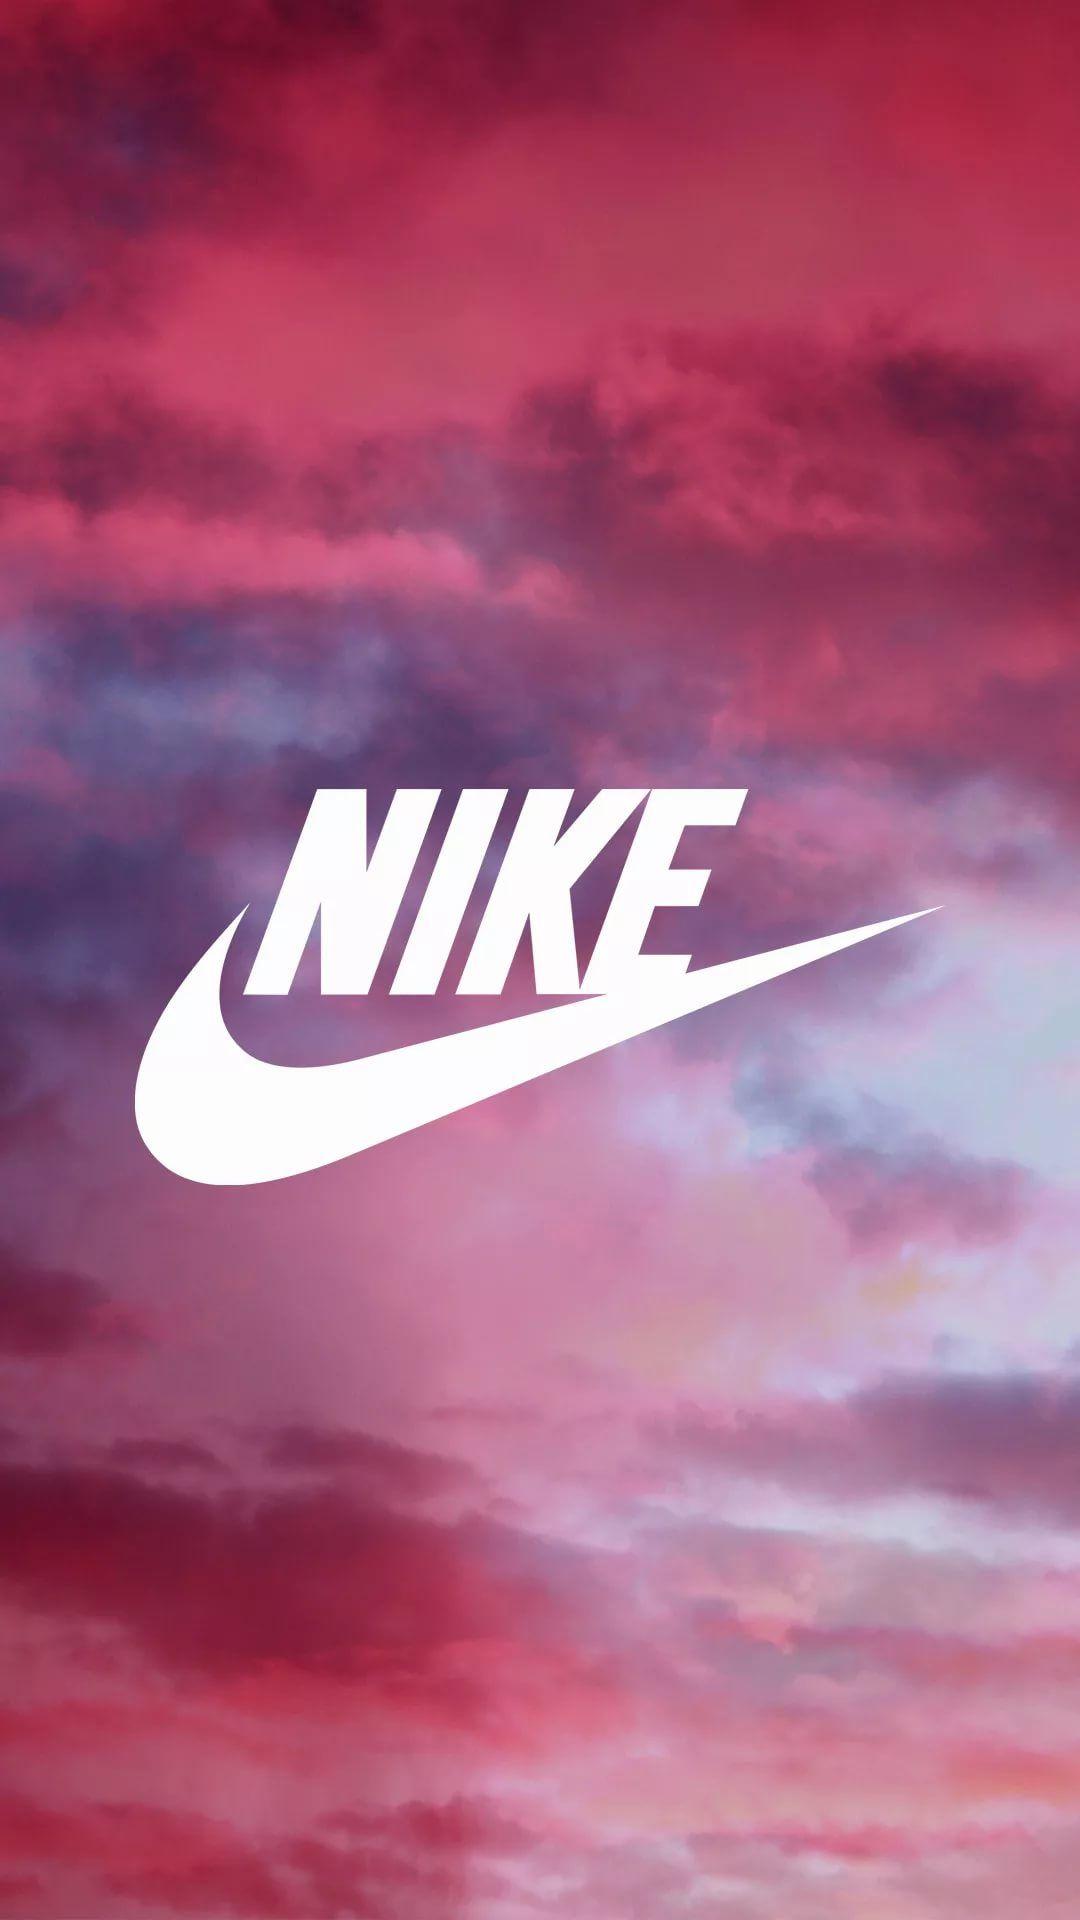 Nike iPhone hd wallpaper